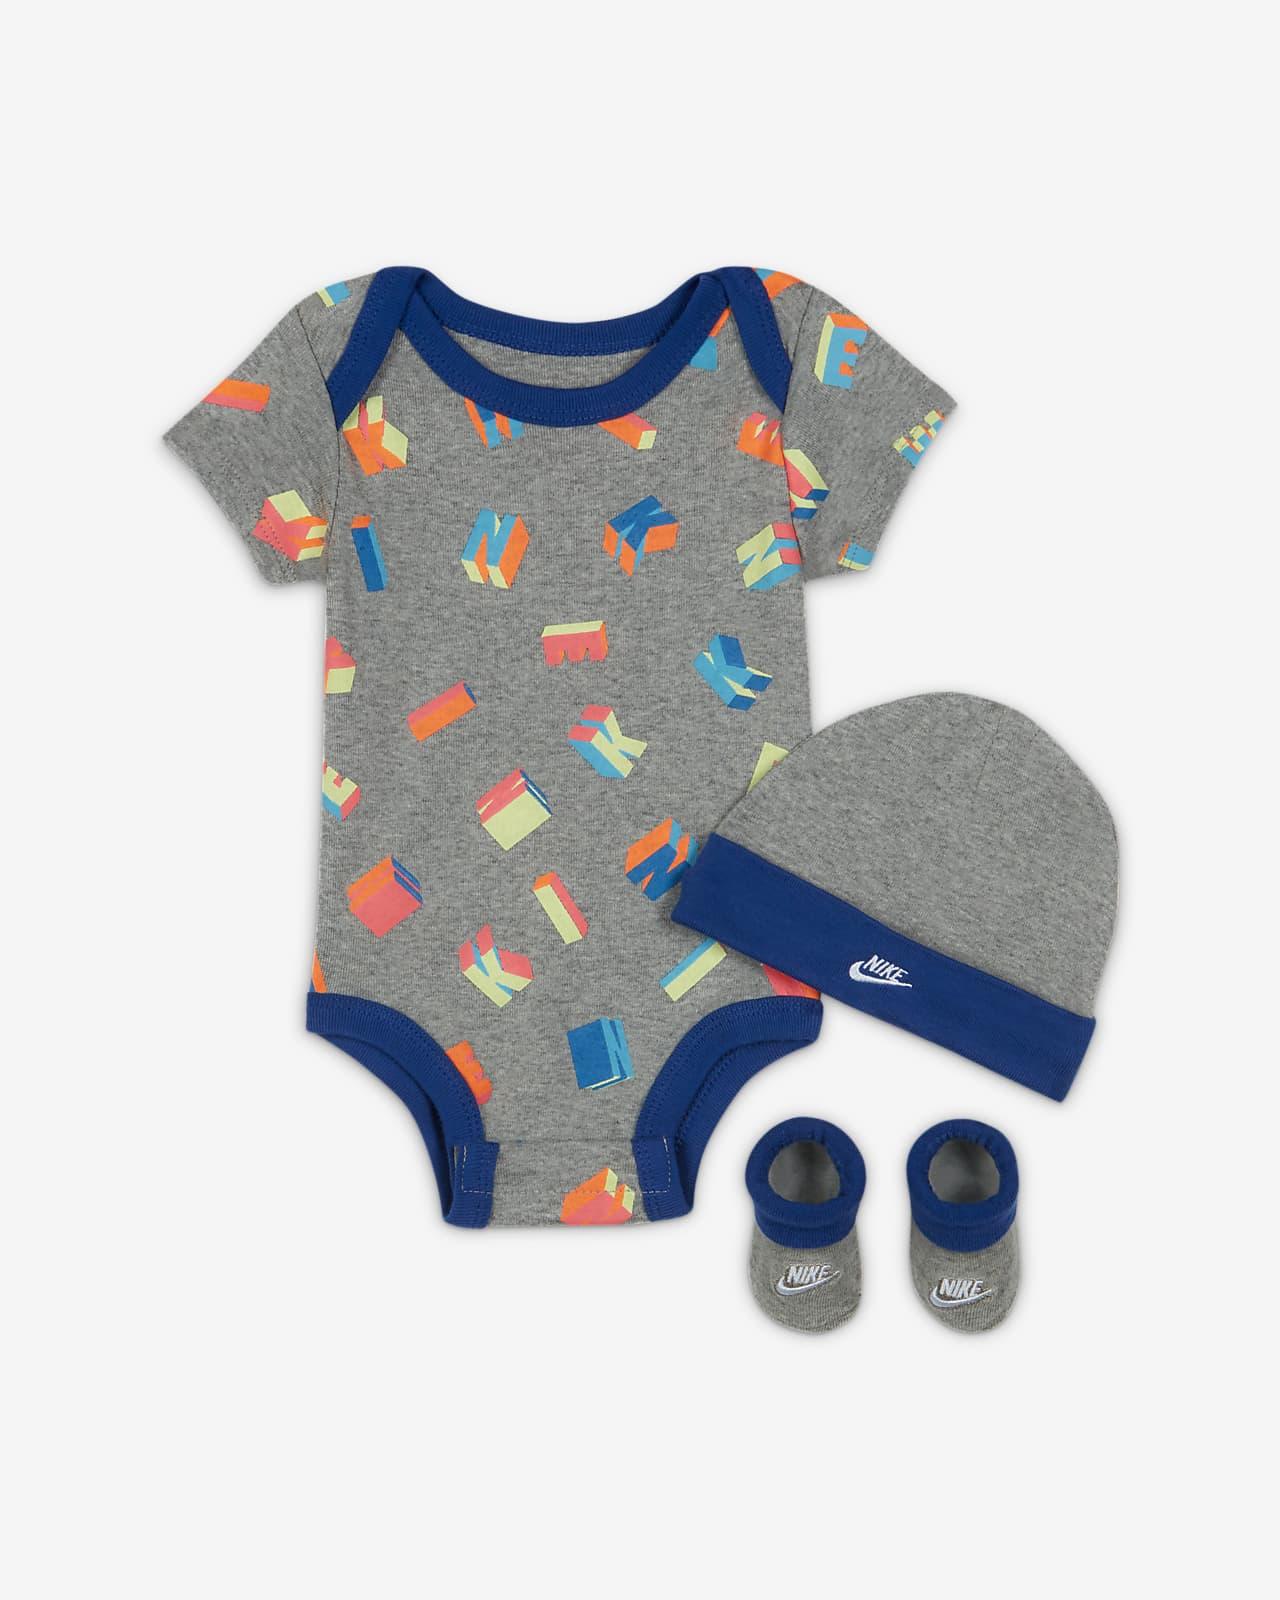 Nike Baby 3-Piece Box Set